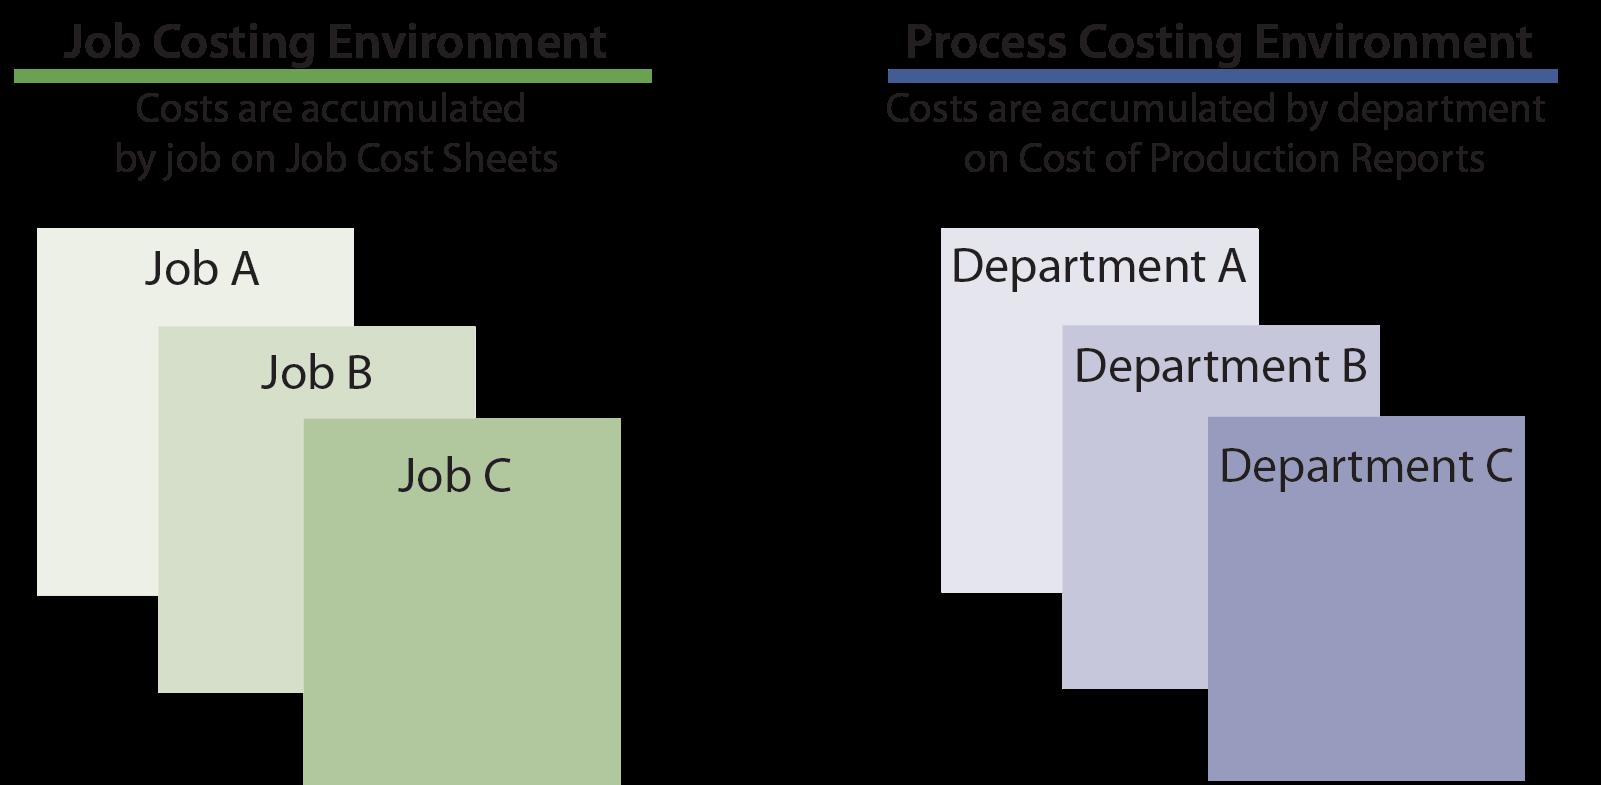 Job Costing vs. Process Costing Illustration